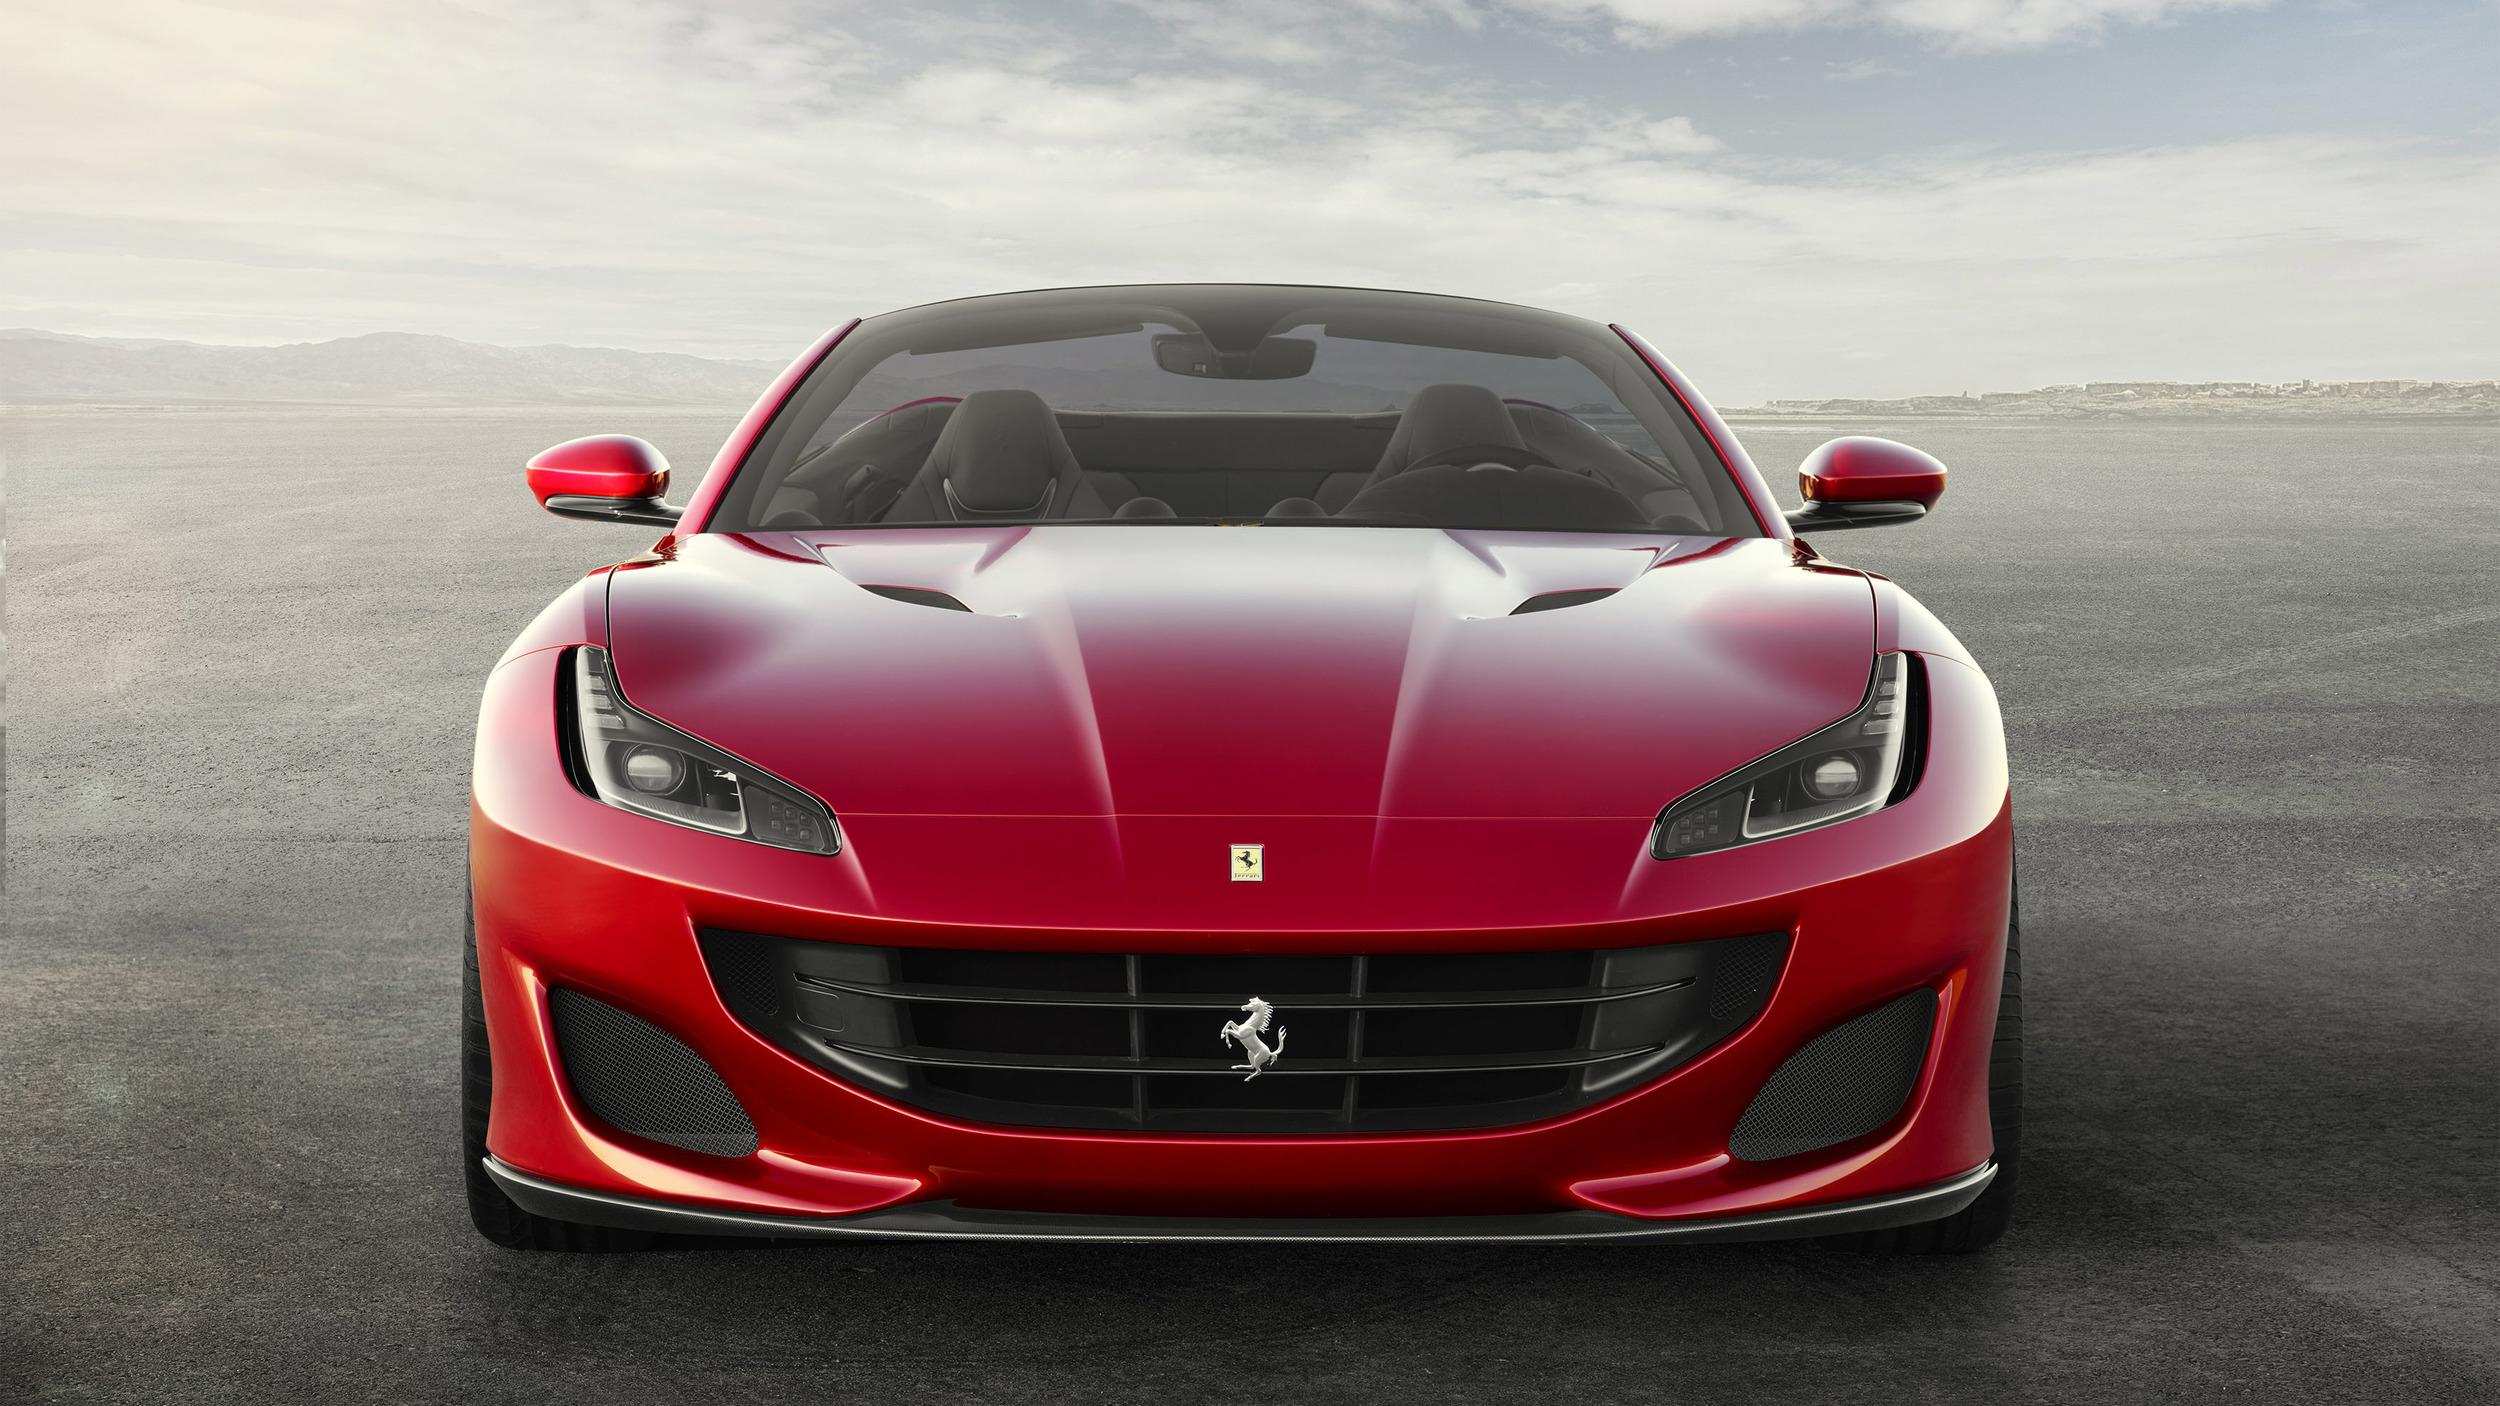 'O mais barato': Ferrari revela o seu novo modelo de entrada